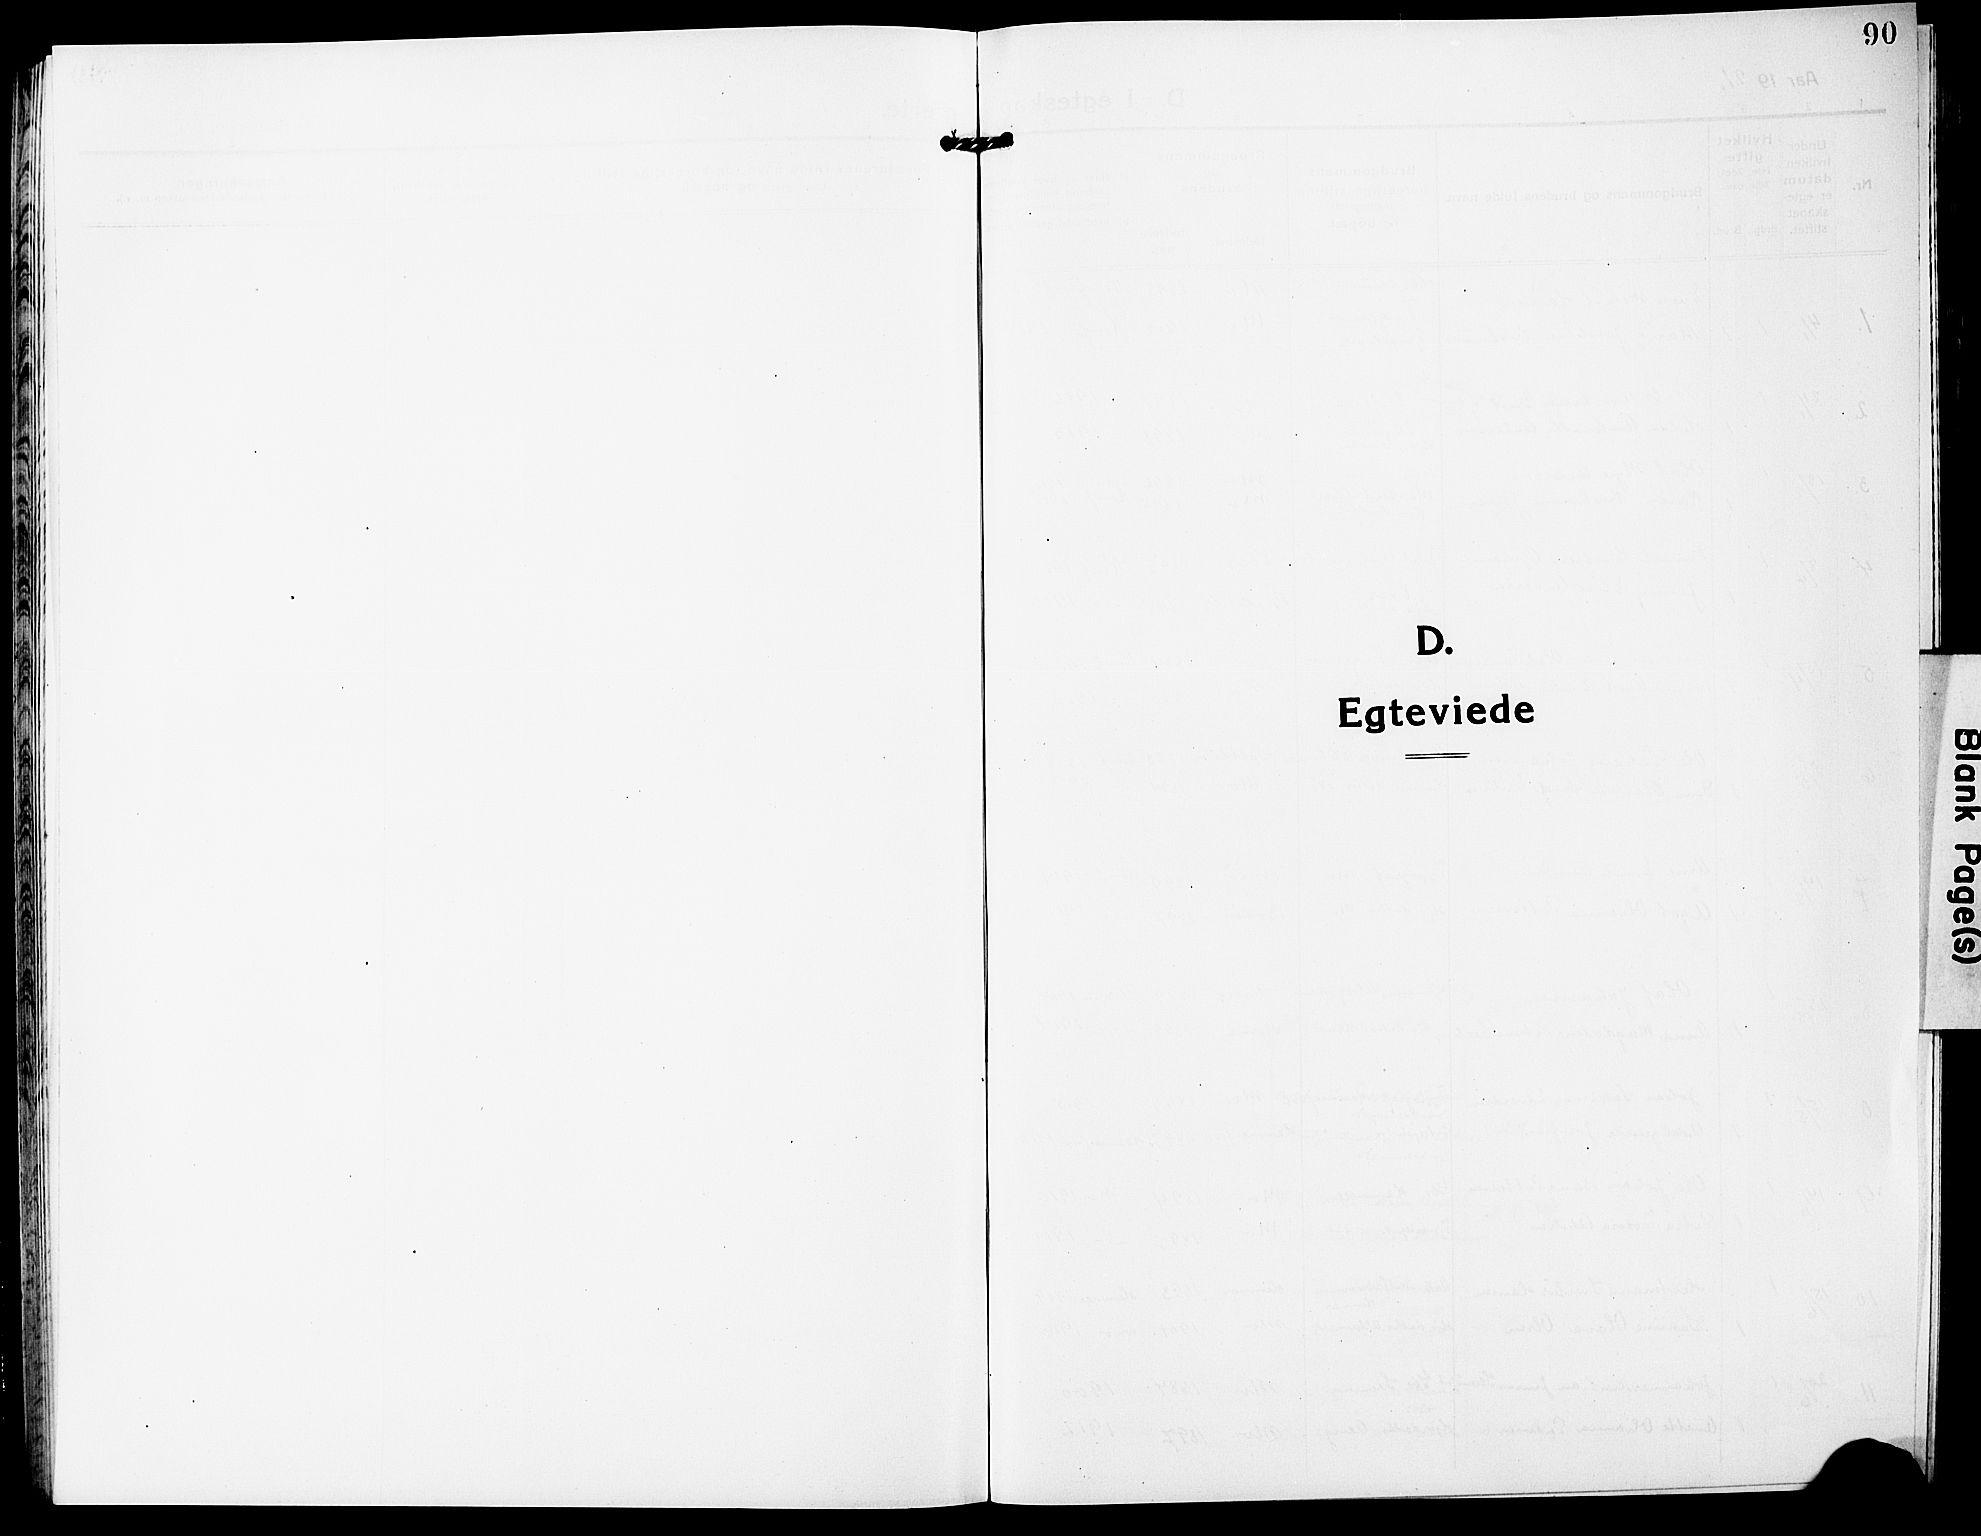 SAT, Ministerialprotokoller, klokkerbøker og fødselsregistre - Nordland, 827/L0424: Klokkerbok nr. 827C13, 1921-1930, s. 90